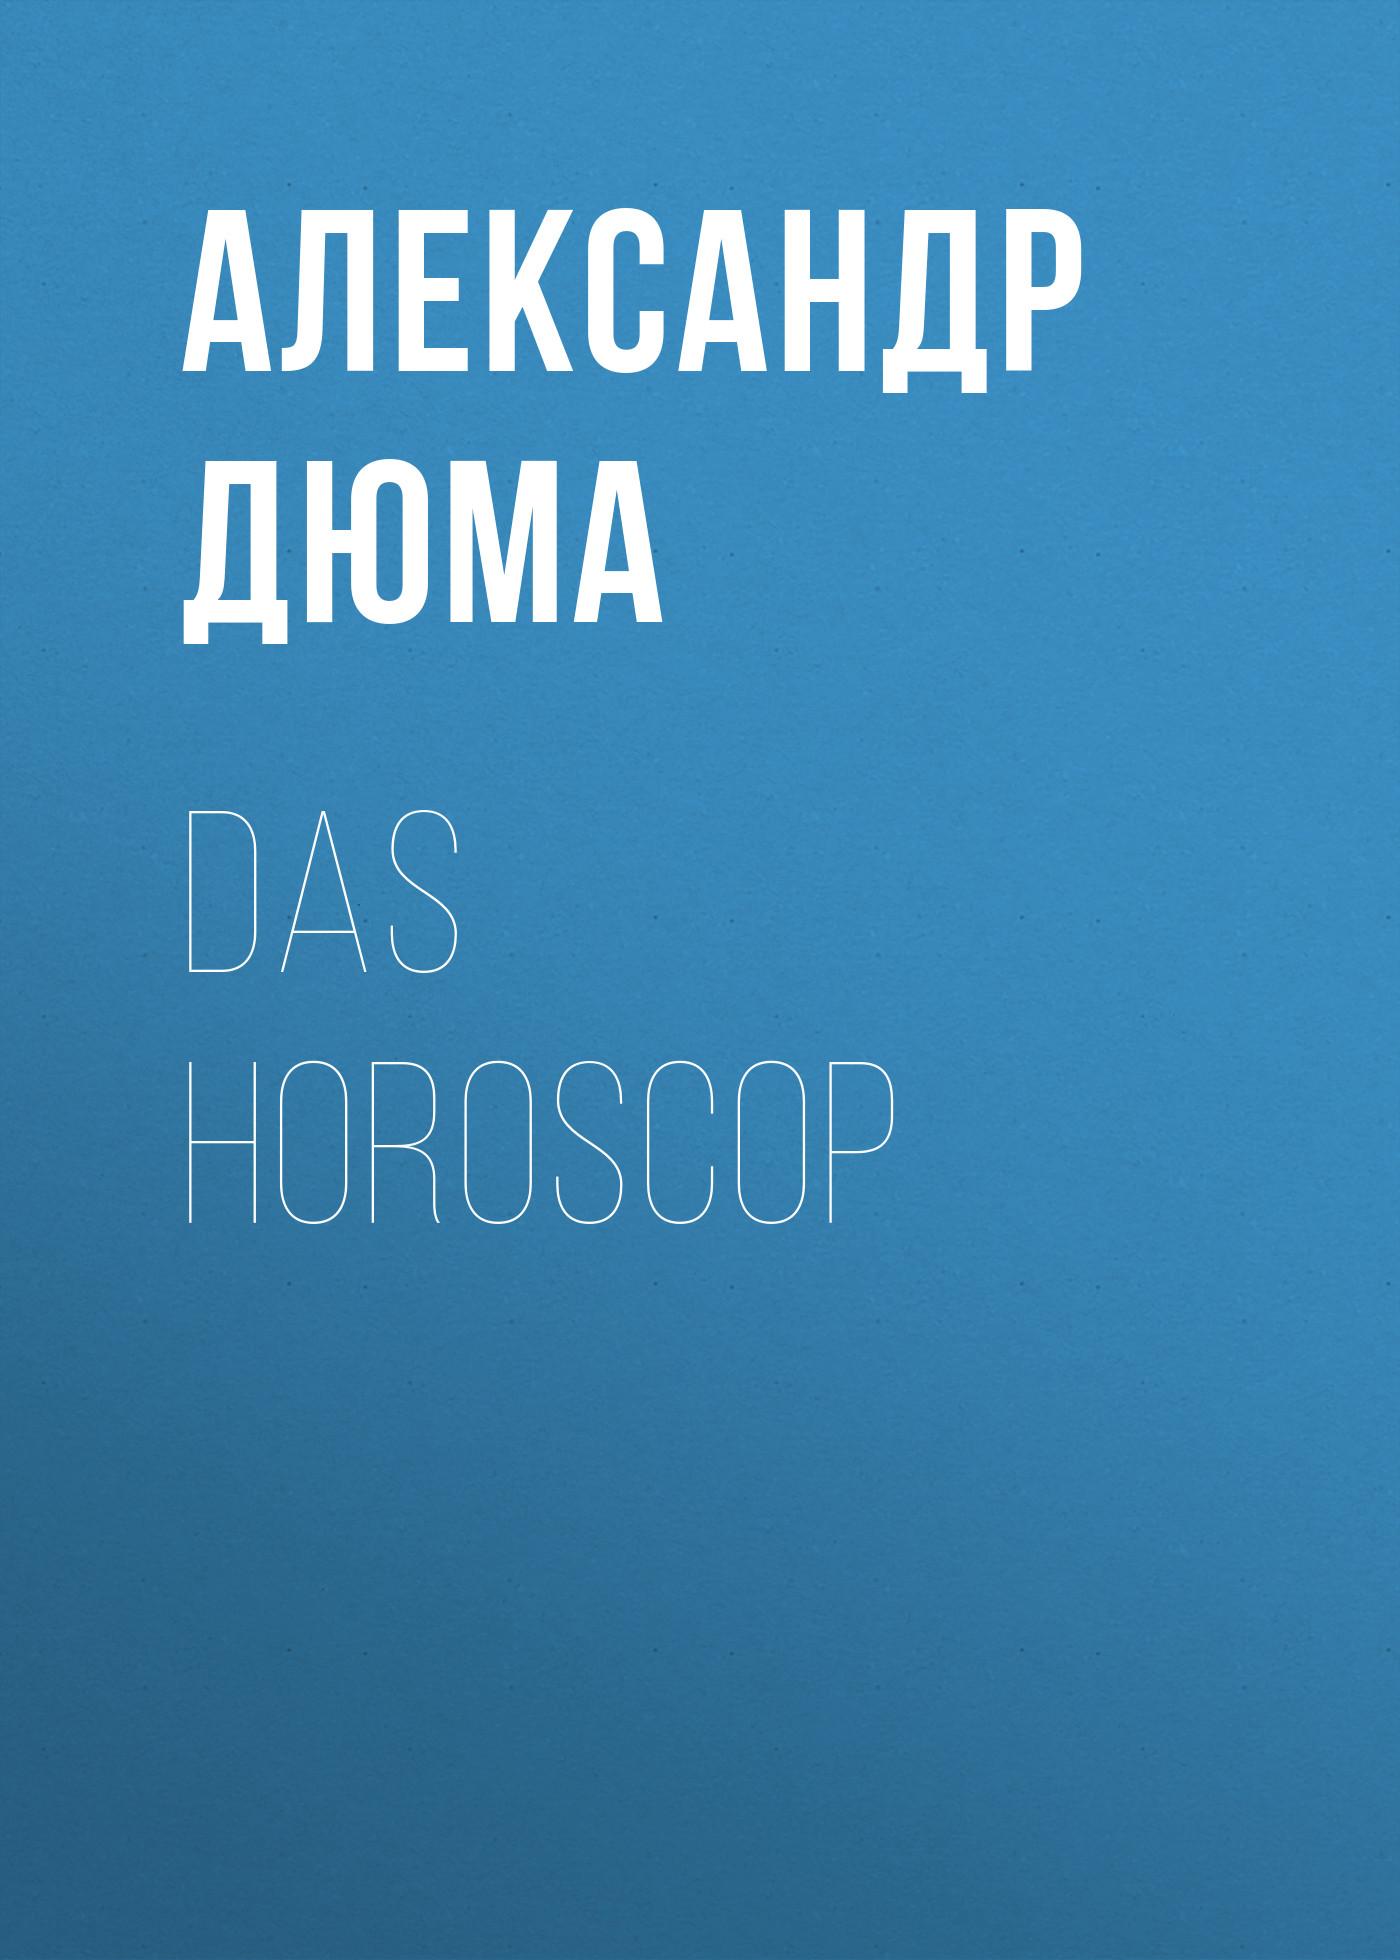 das horoscop